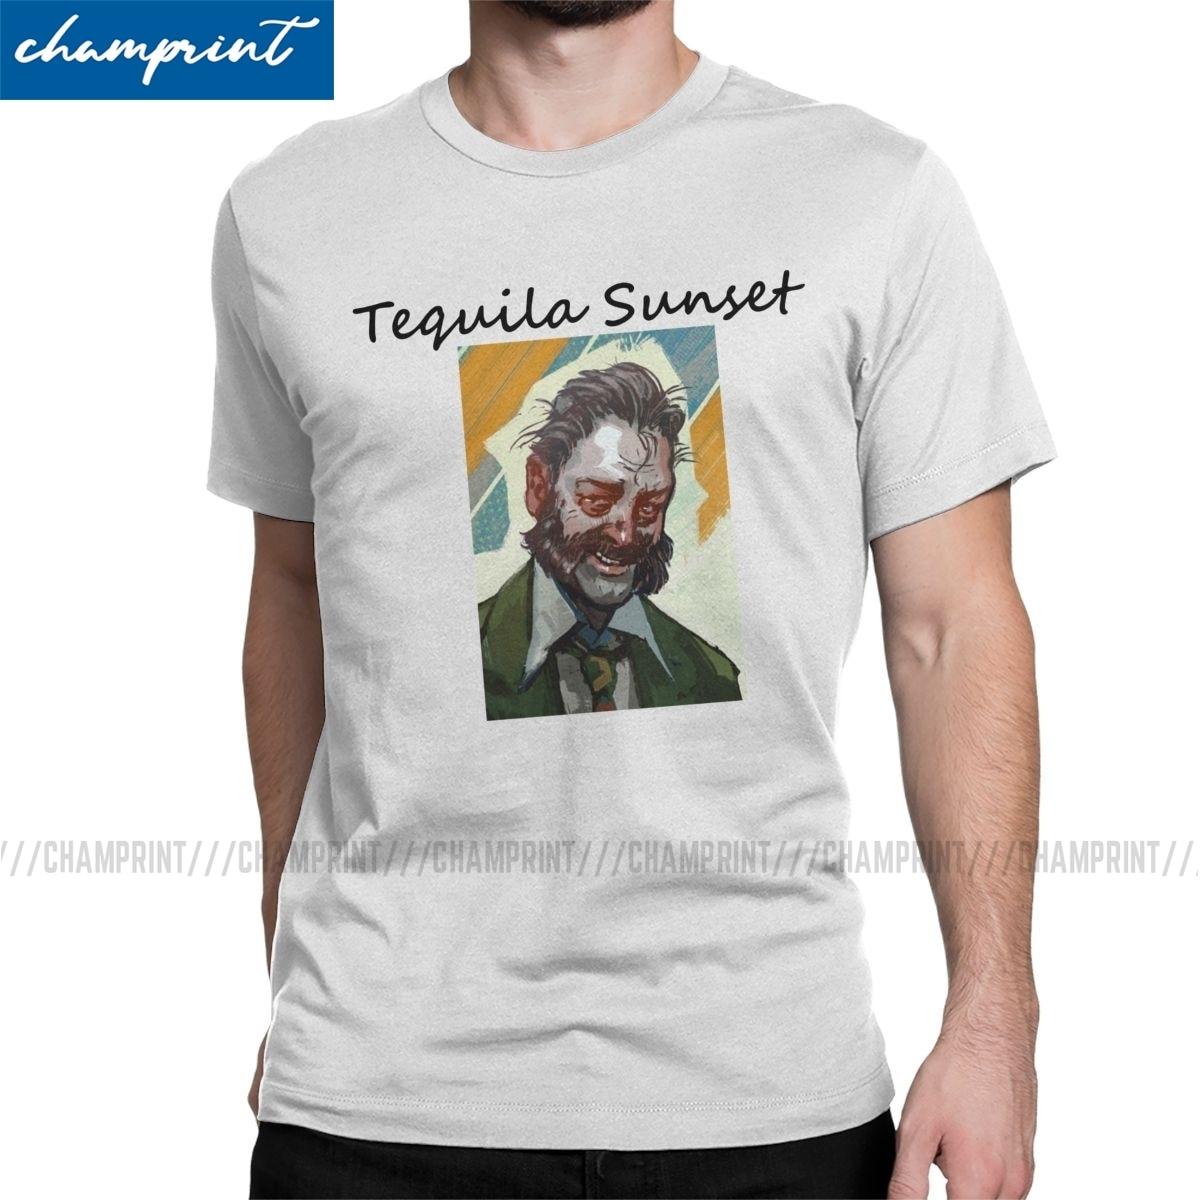 Disco Elysium Tequila Sunset T-Shirt Men Humorous Cotton Tees Round Neck Short Sleeve T Shirt Printing Tops